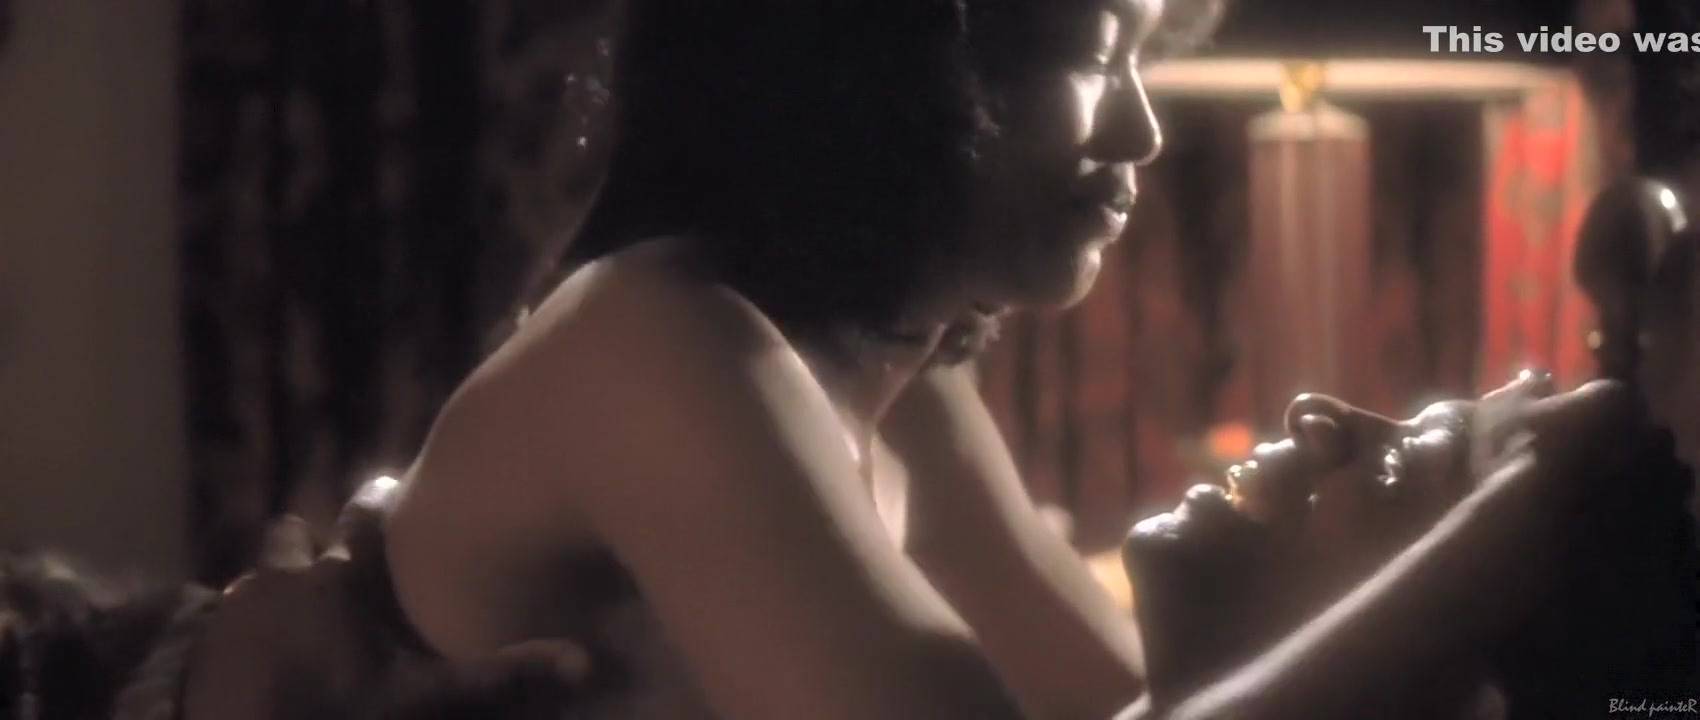 Pron Videos Naked guy locker room